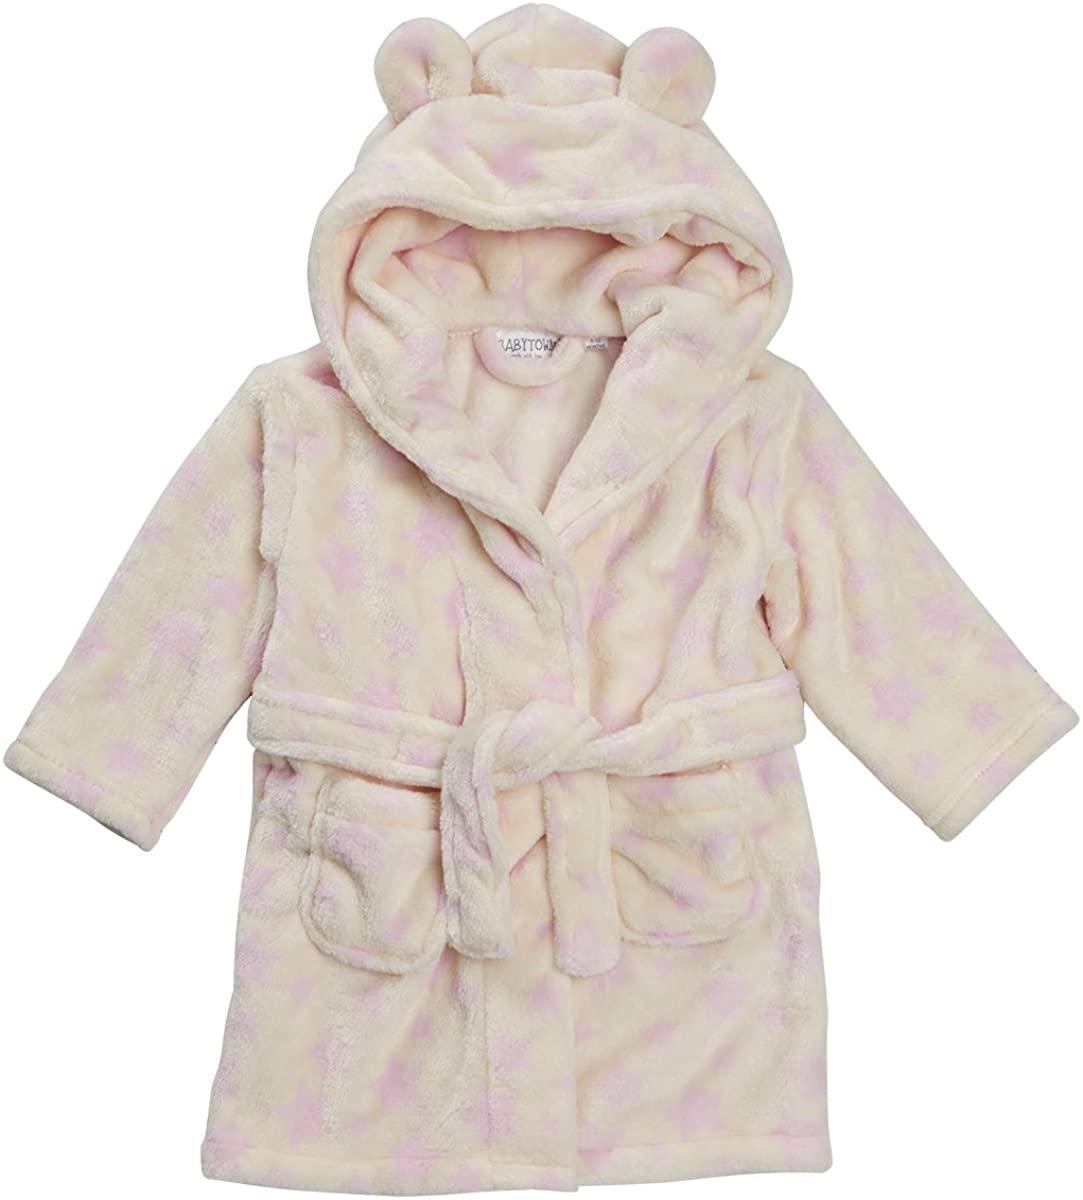 Babytown Toddler Baby Girls Star Print Night Robe (Ages 6-24 Months) Hooded Fleece Gown in Pink & Cream Beige